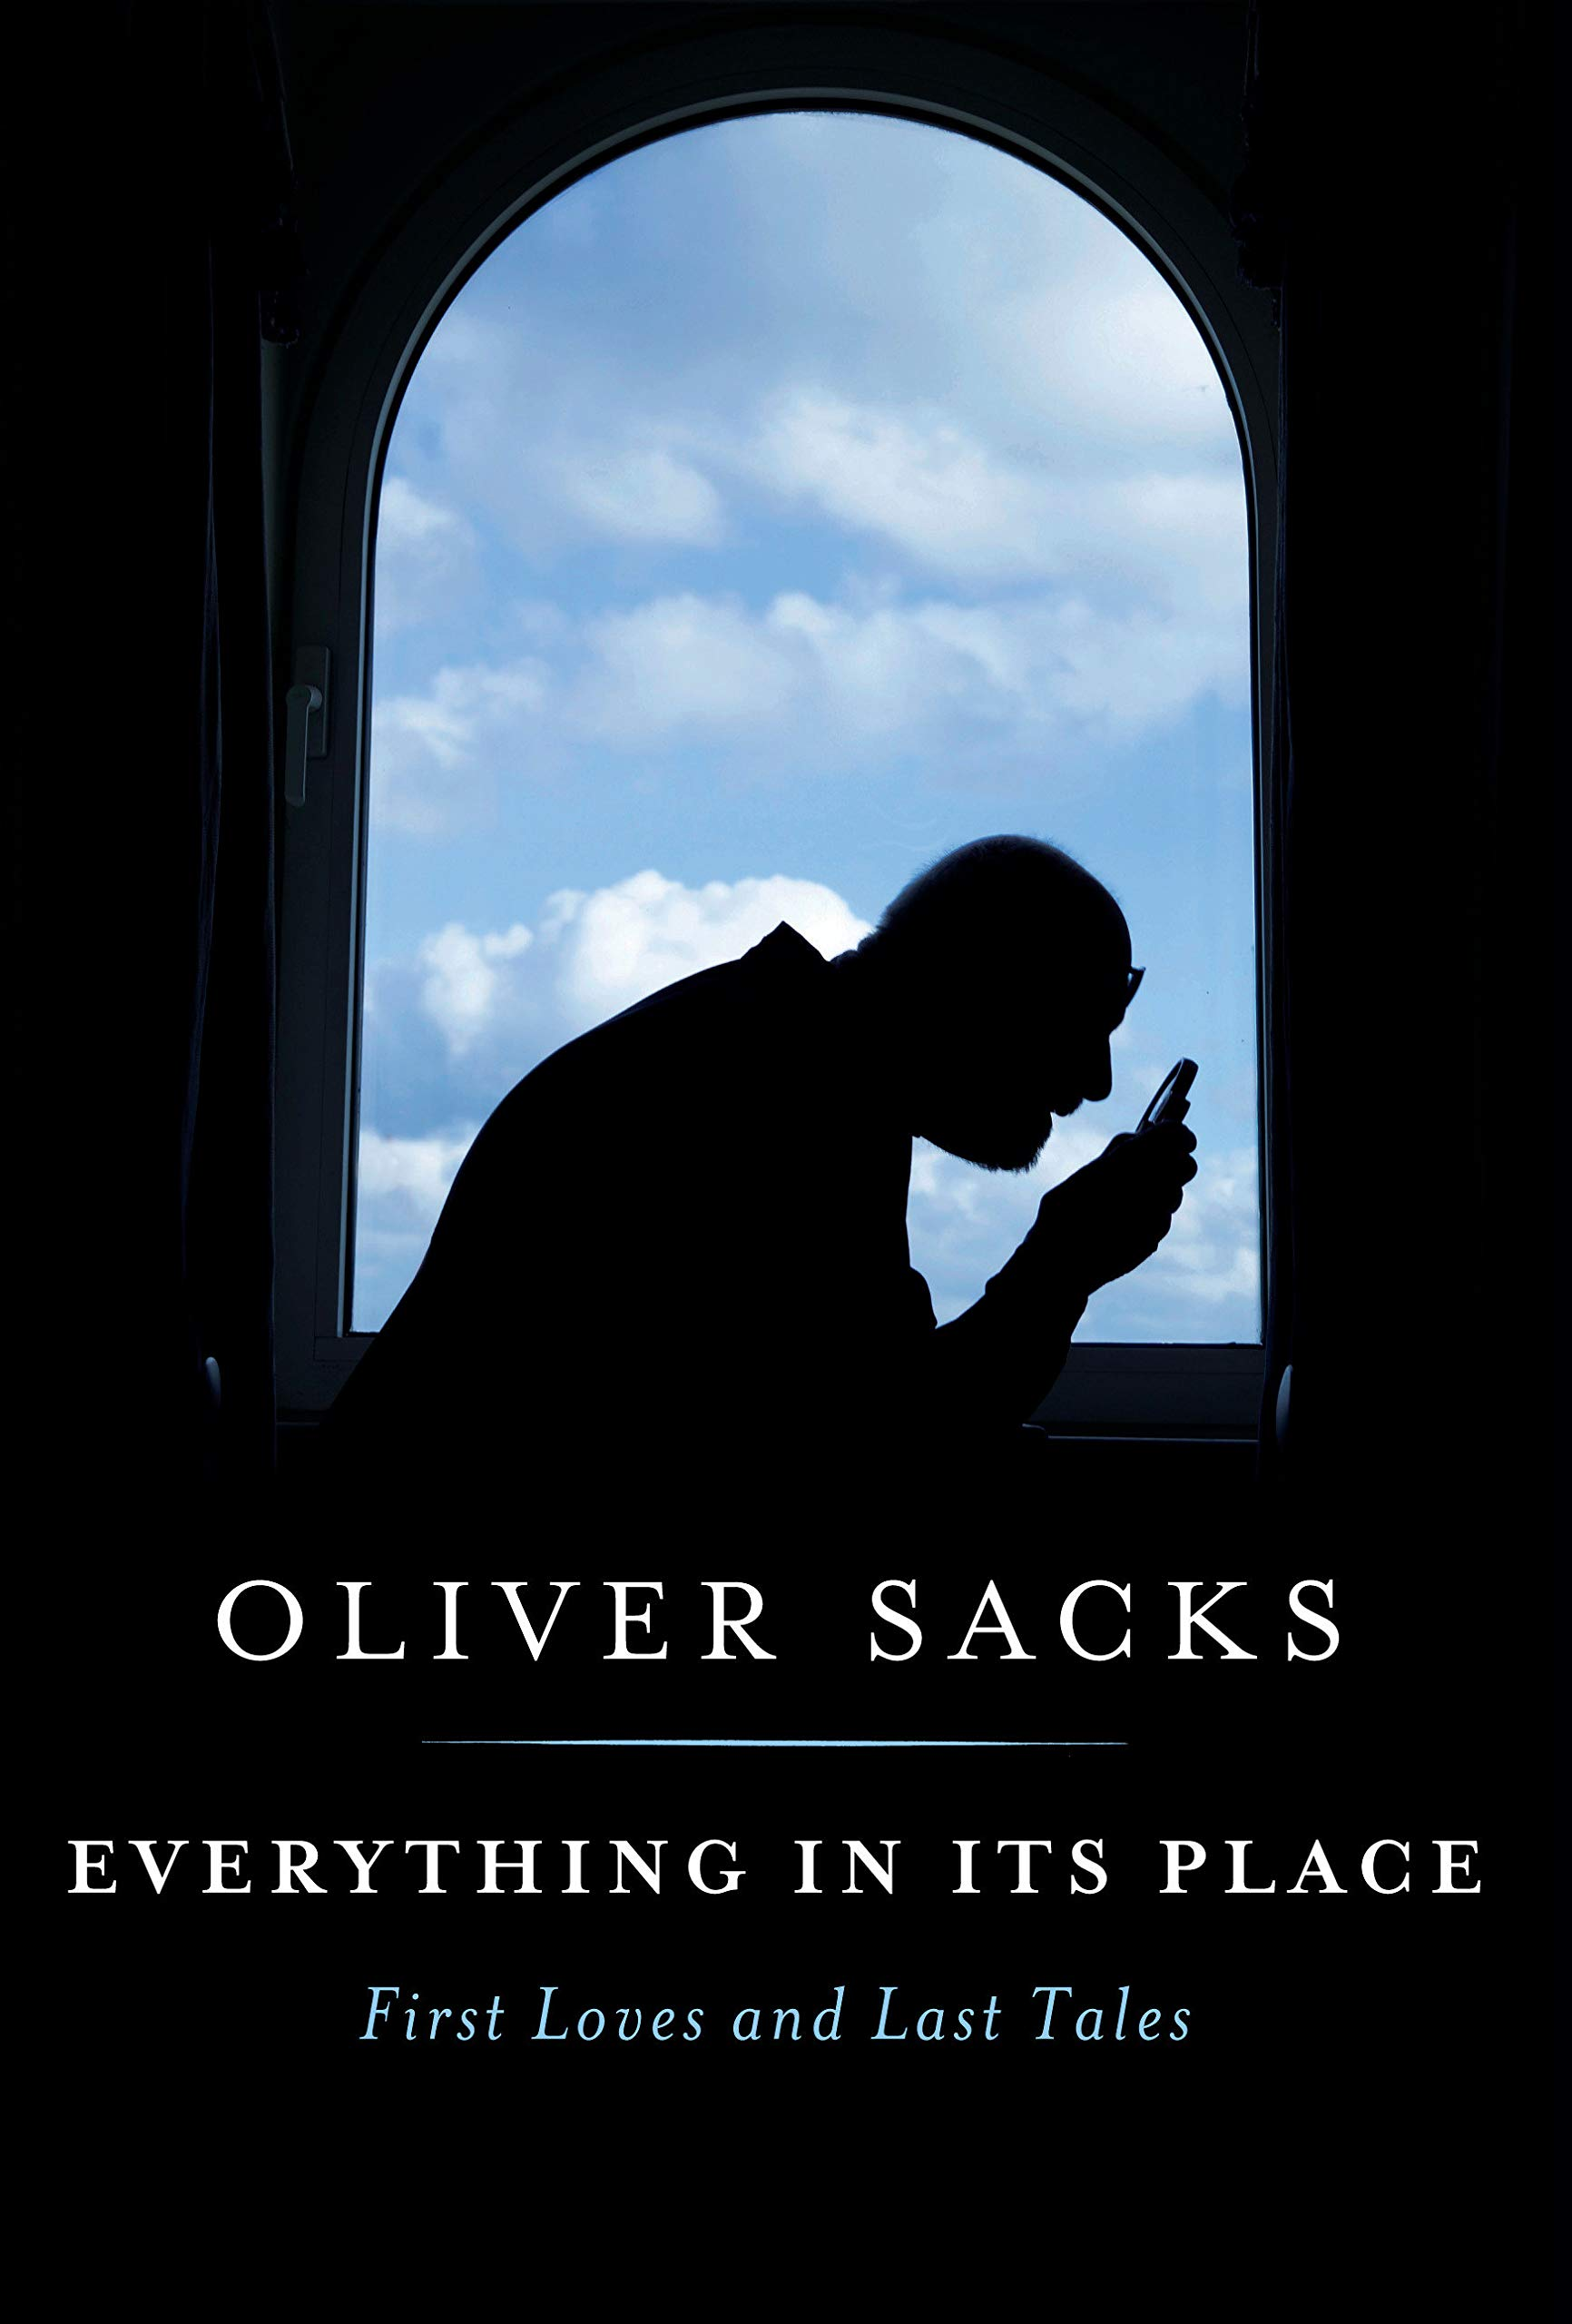 Oliver sacks essays professional admission paper editor service for college